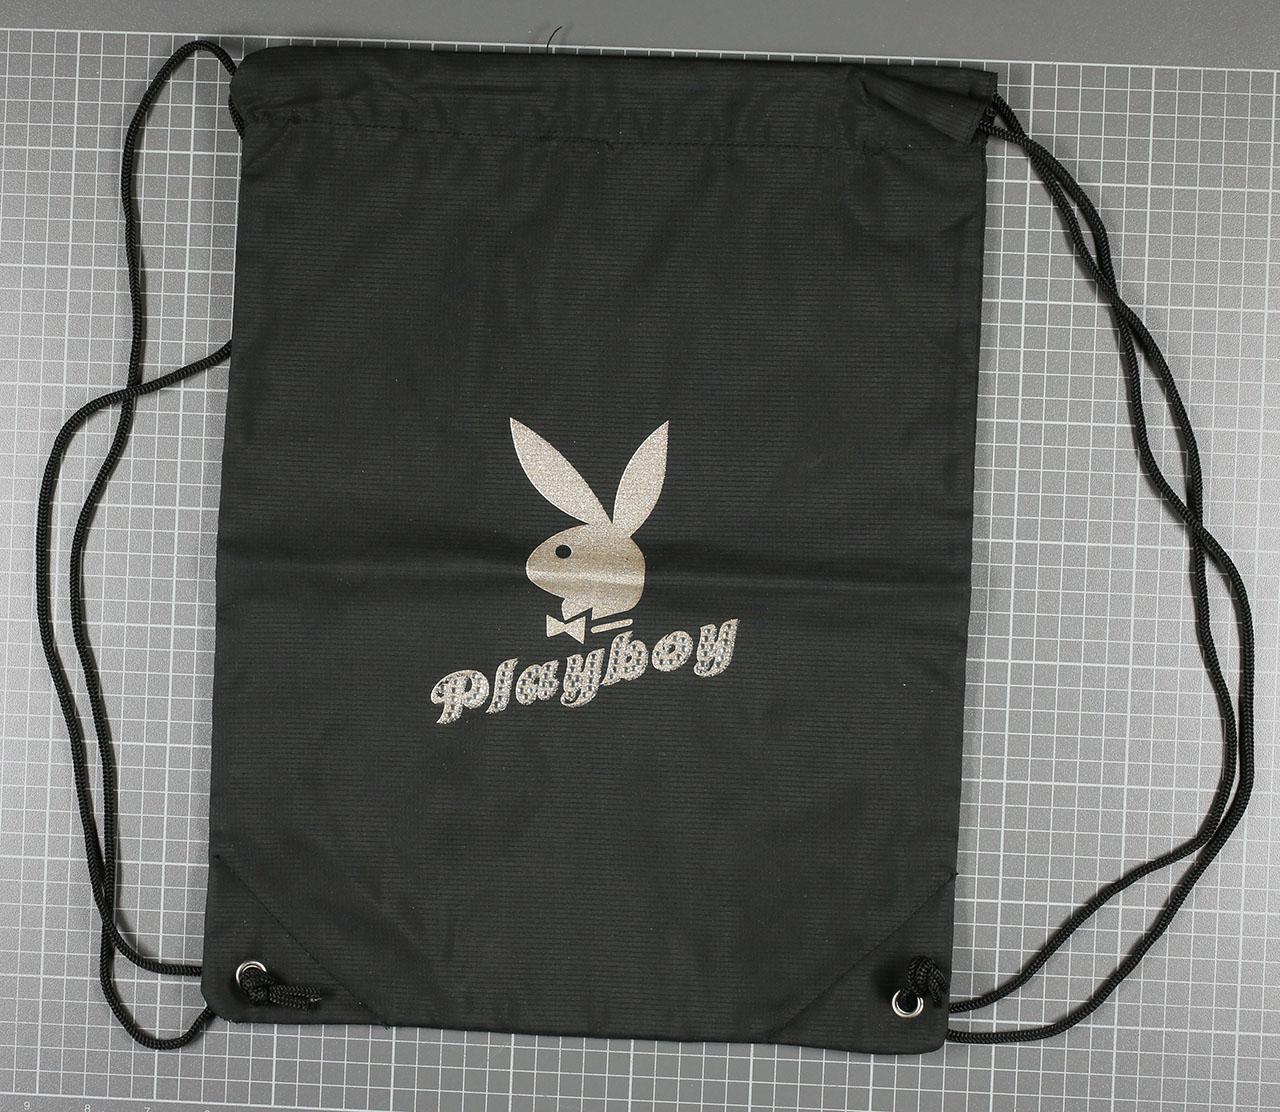 Sac à dos tissus Noir Petite Tête, Playboy-0